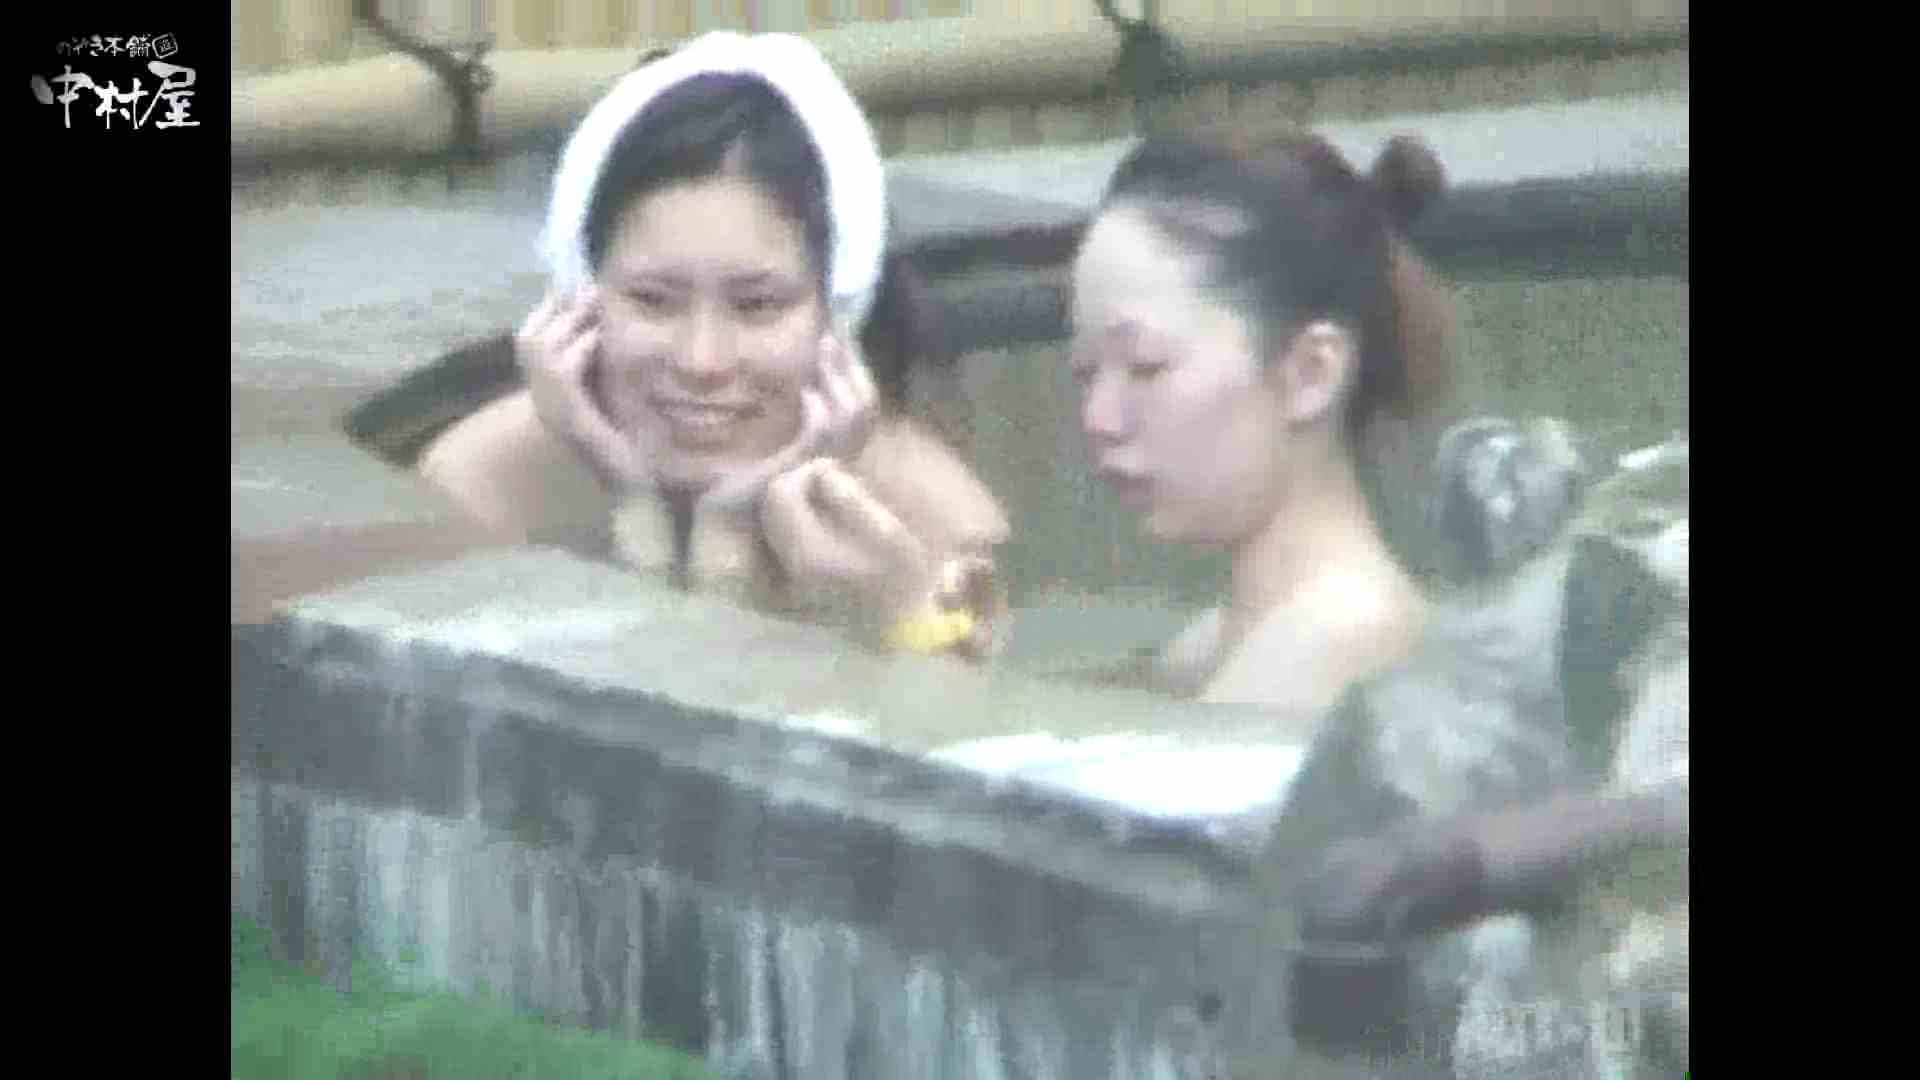 Aquaな露天風呂Vol.874潜入盗撮露天風呂十判湯 其の三 盗撮 のぞき動画画像 39連発 22